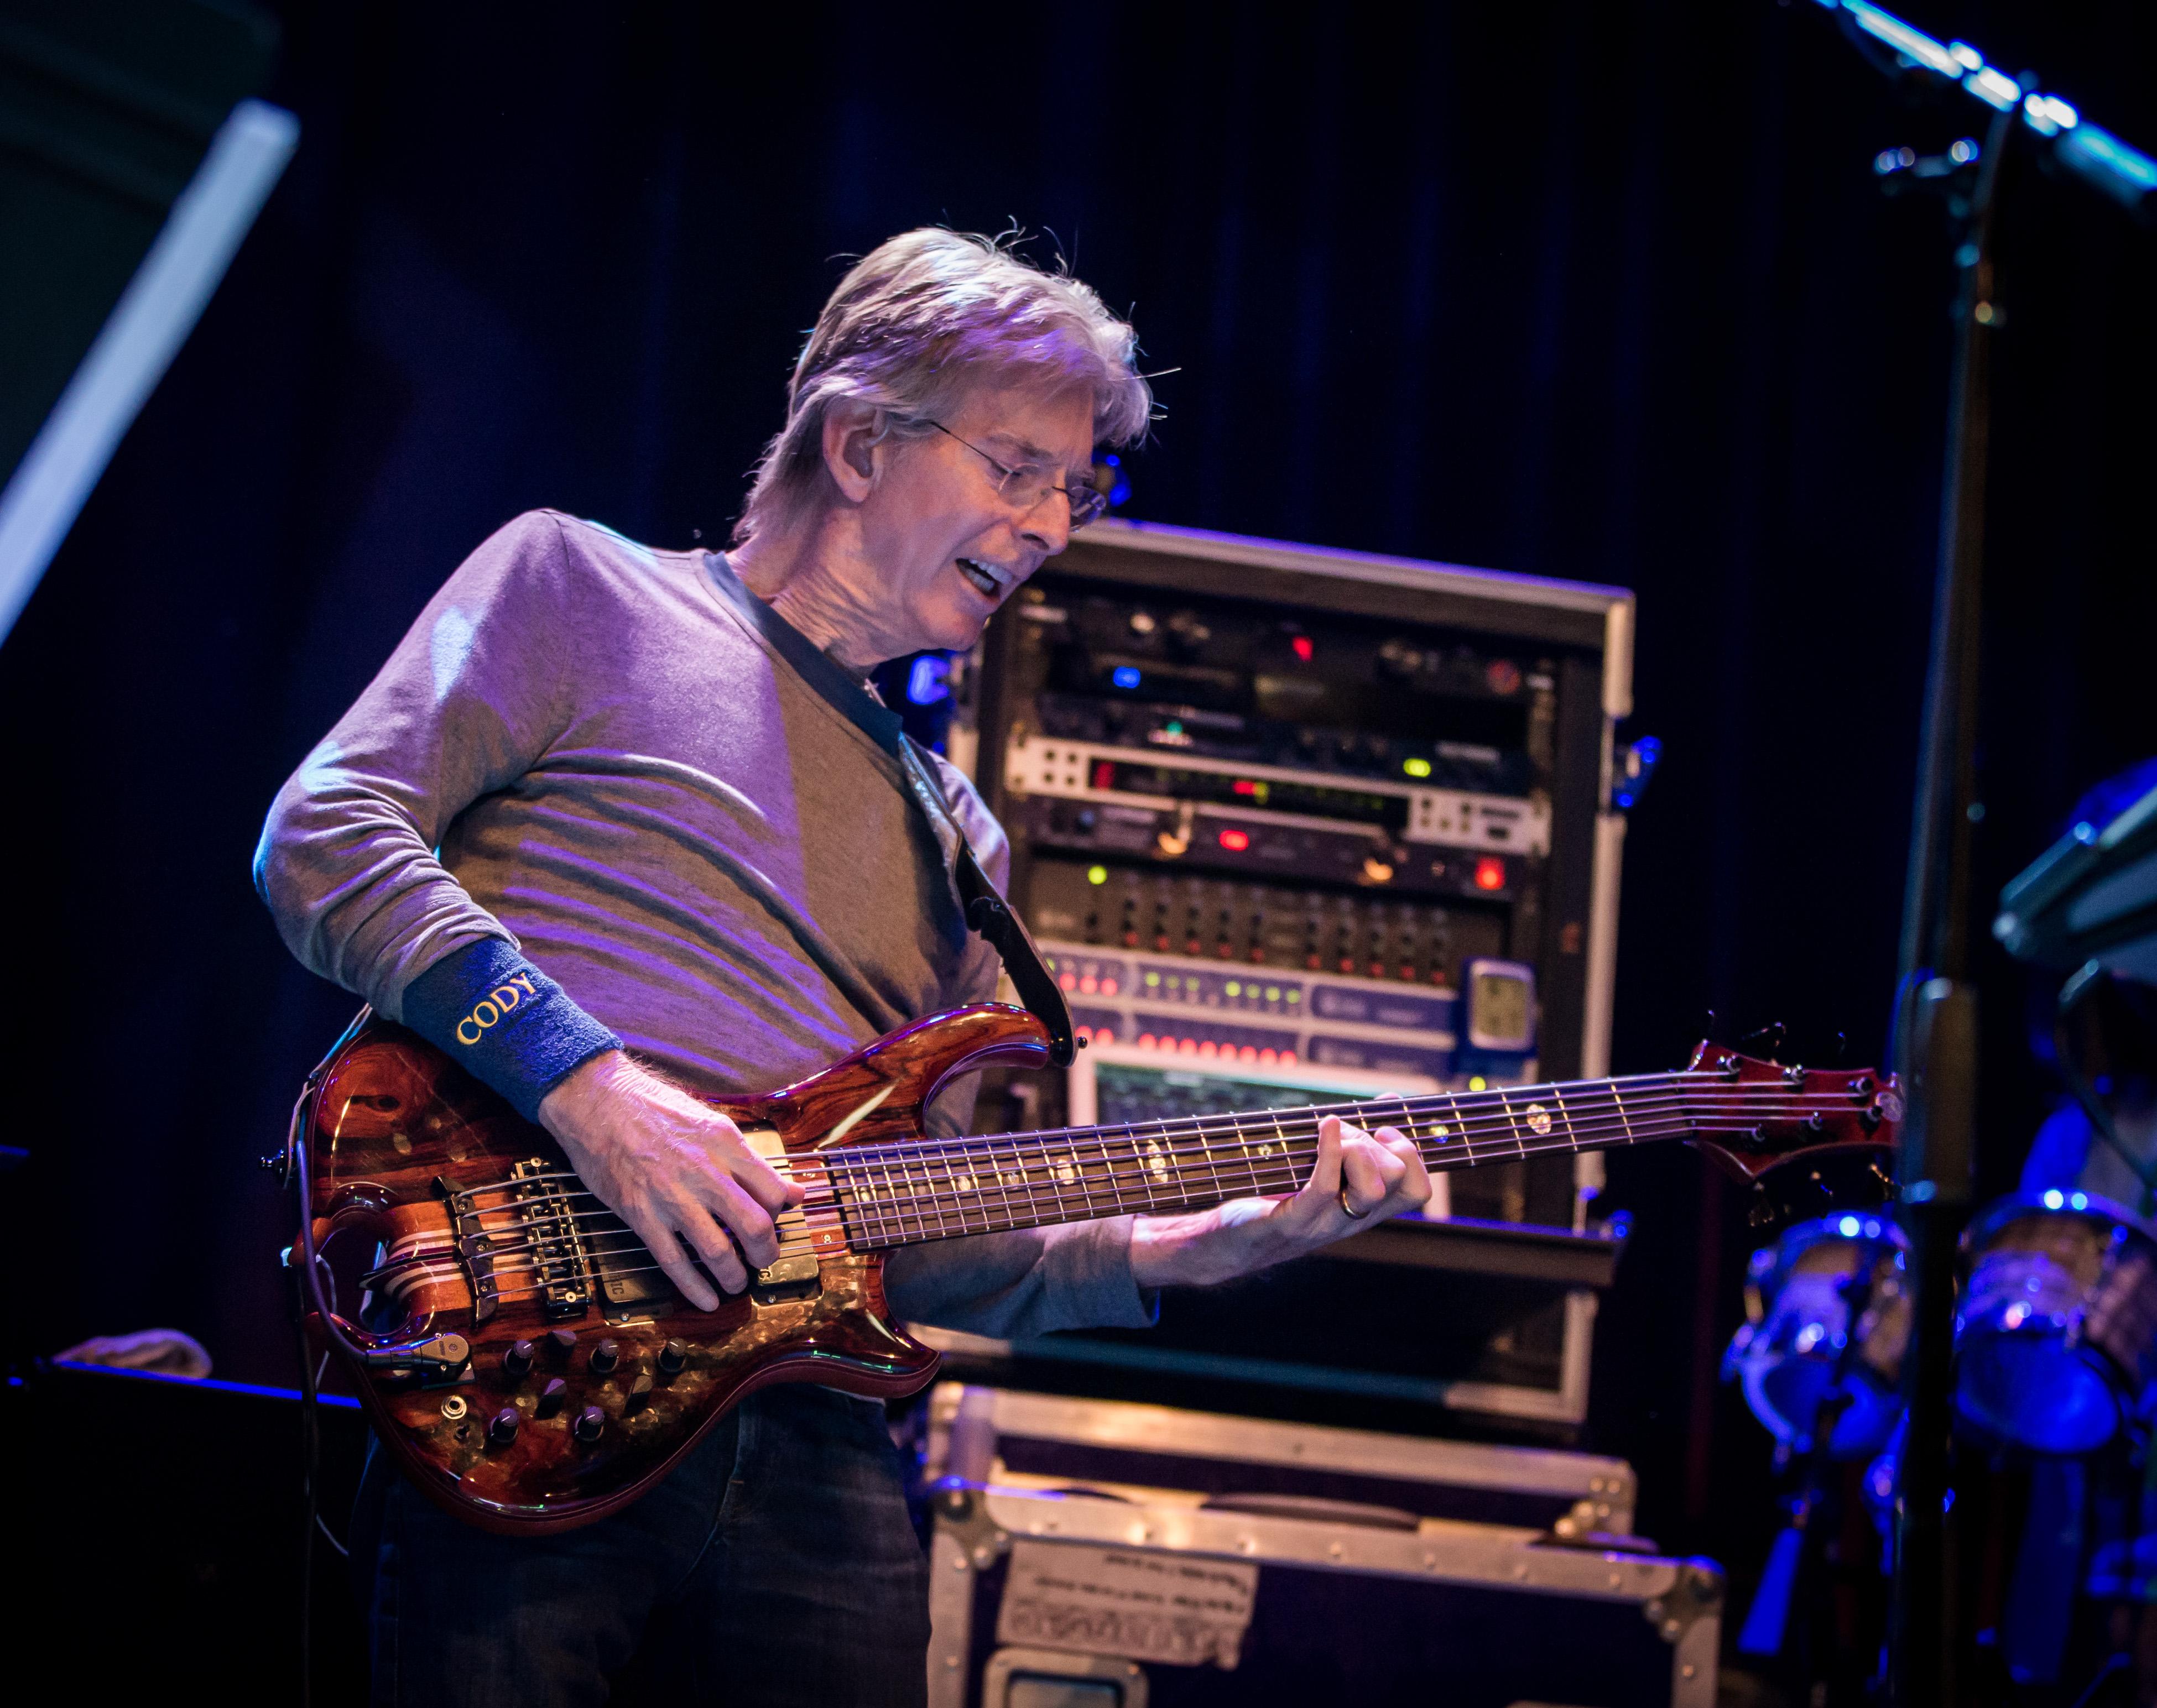 Grateful Dead's Phil Lesh Donates $10,000 to Christine Blasey Ford